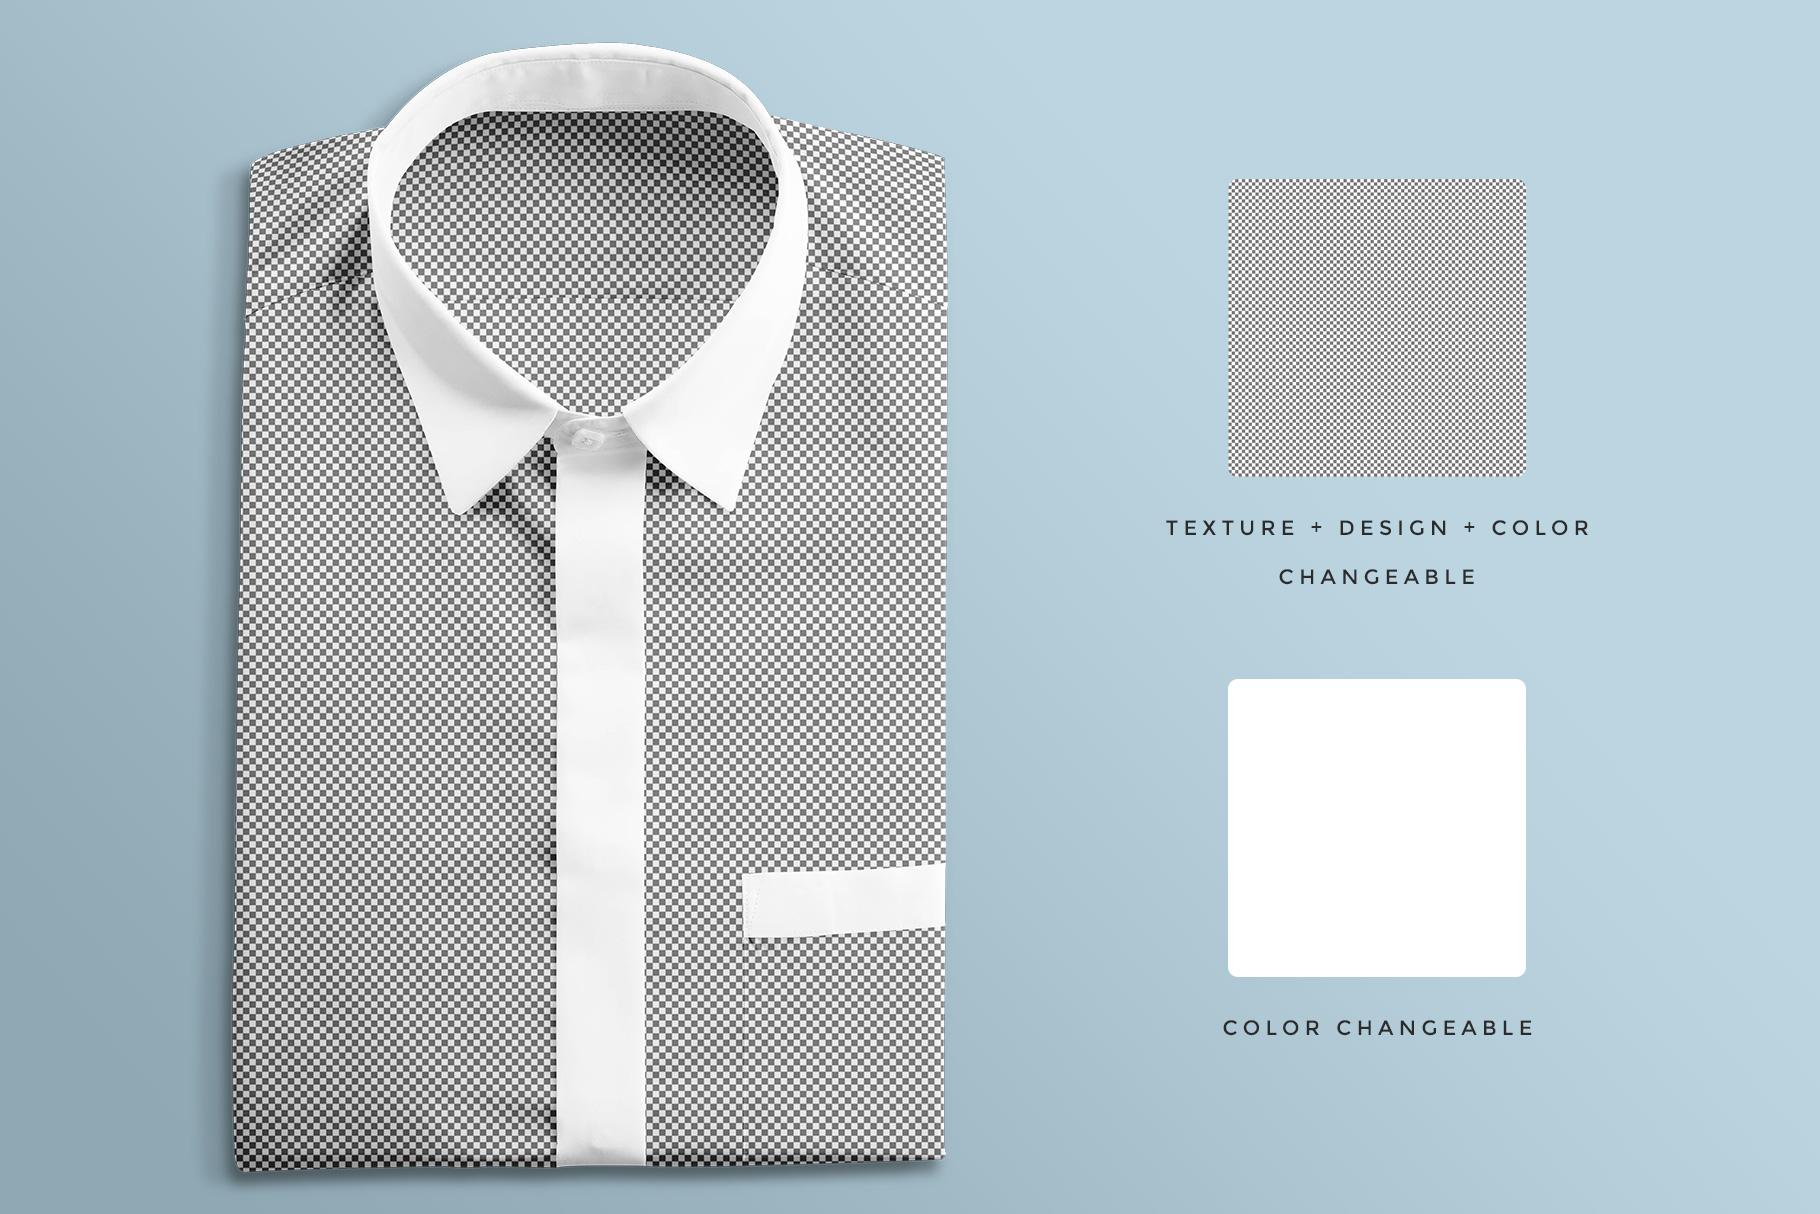 editability of the topview male folded shirt mockup